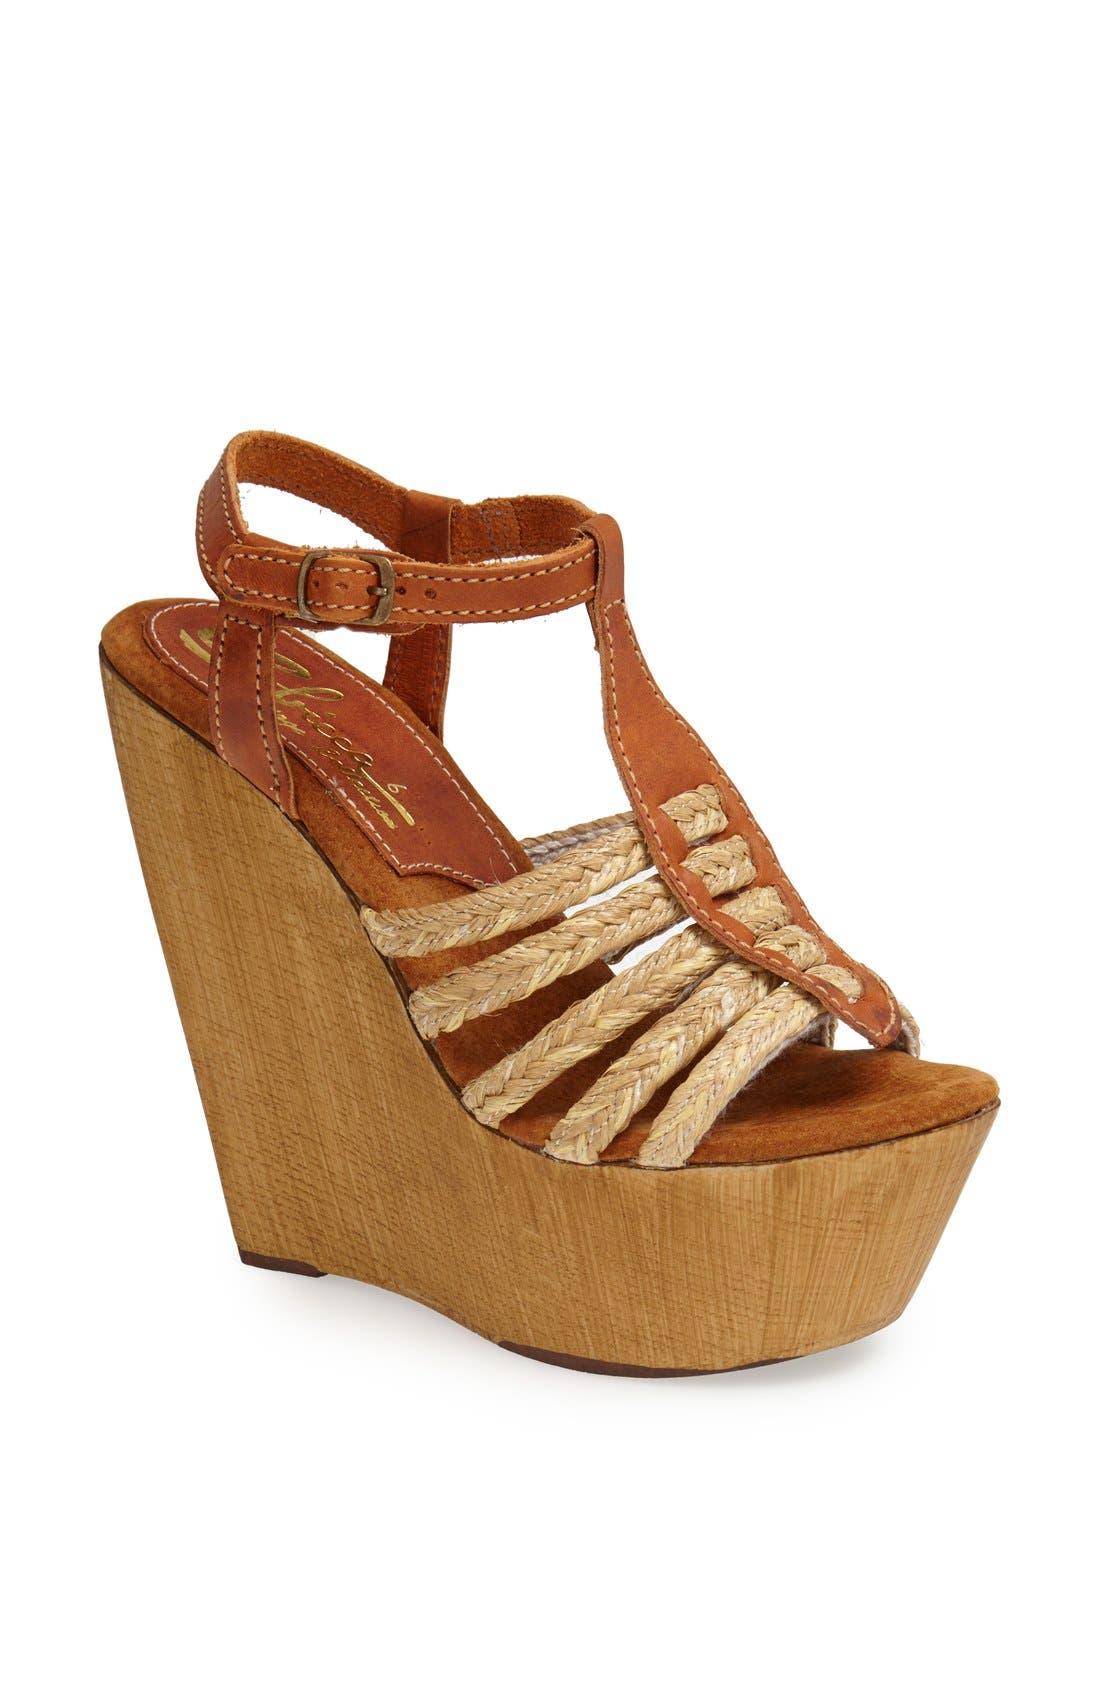 Main Image - Sbicca 'Bimini' Wedge Sandal